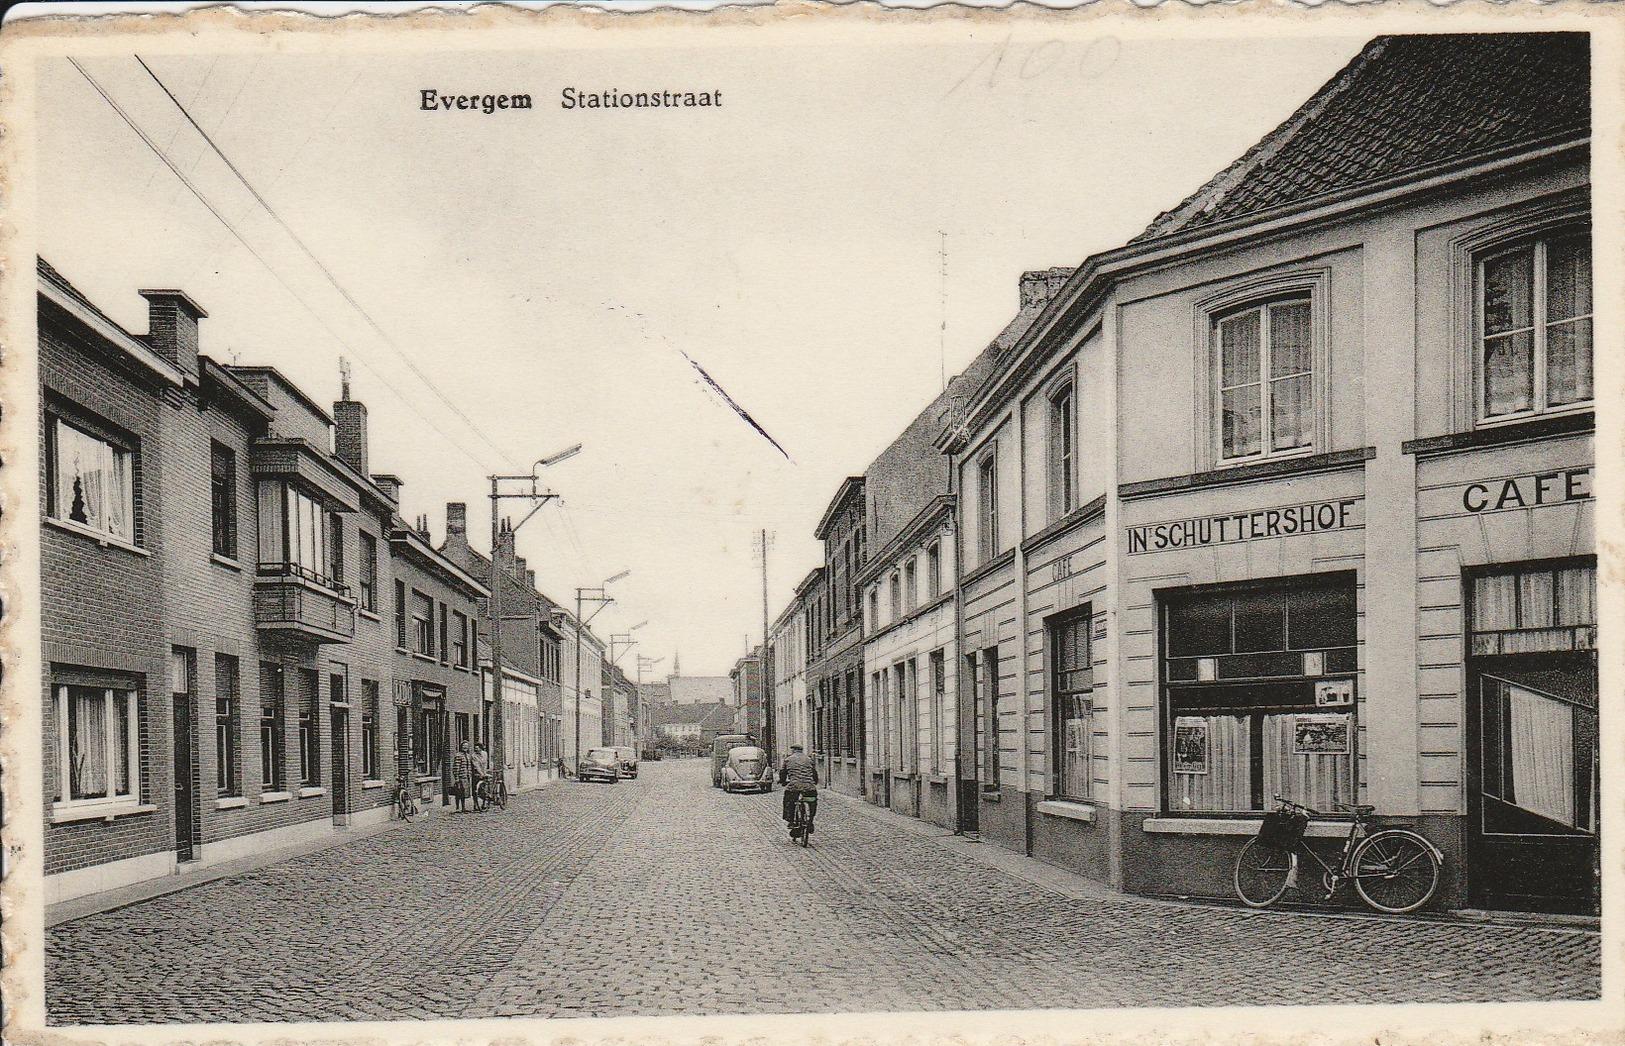 Evergem  Stationstraat - Evergem